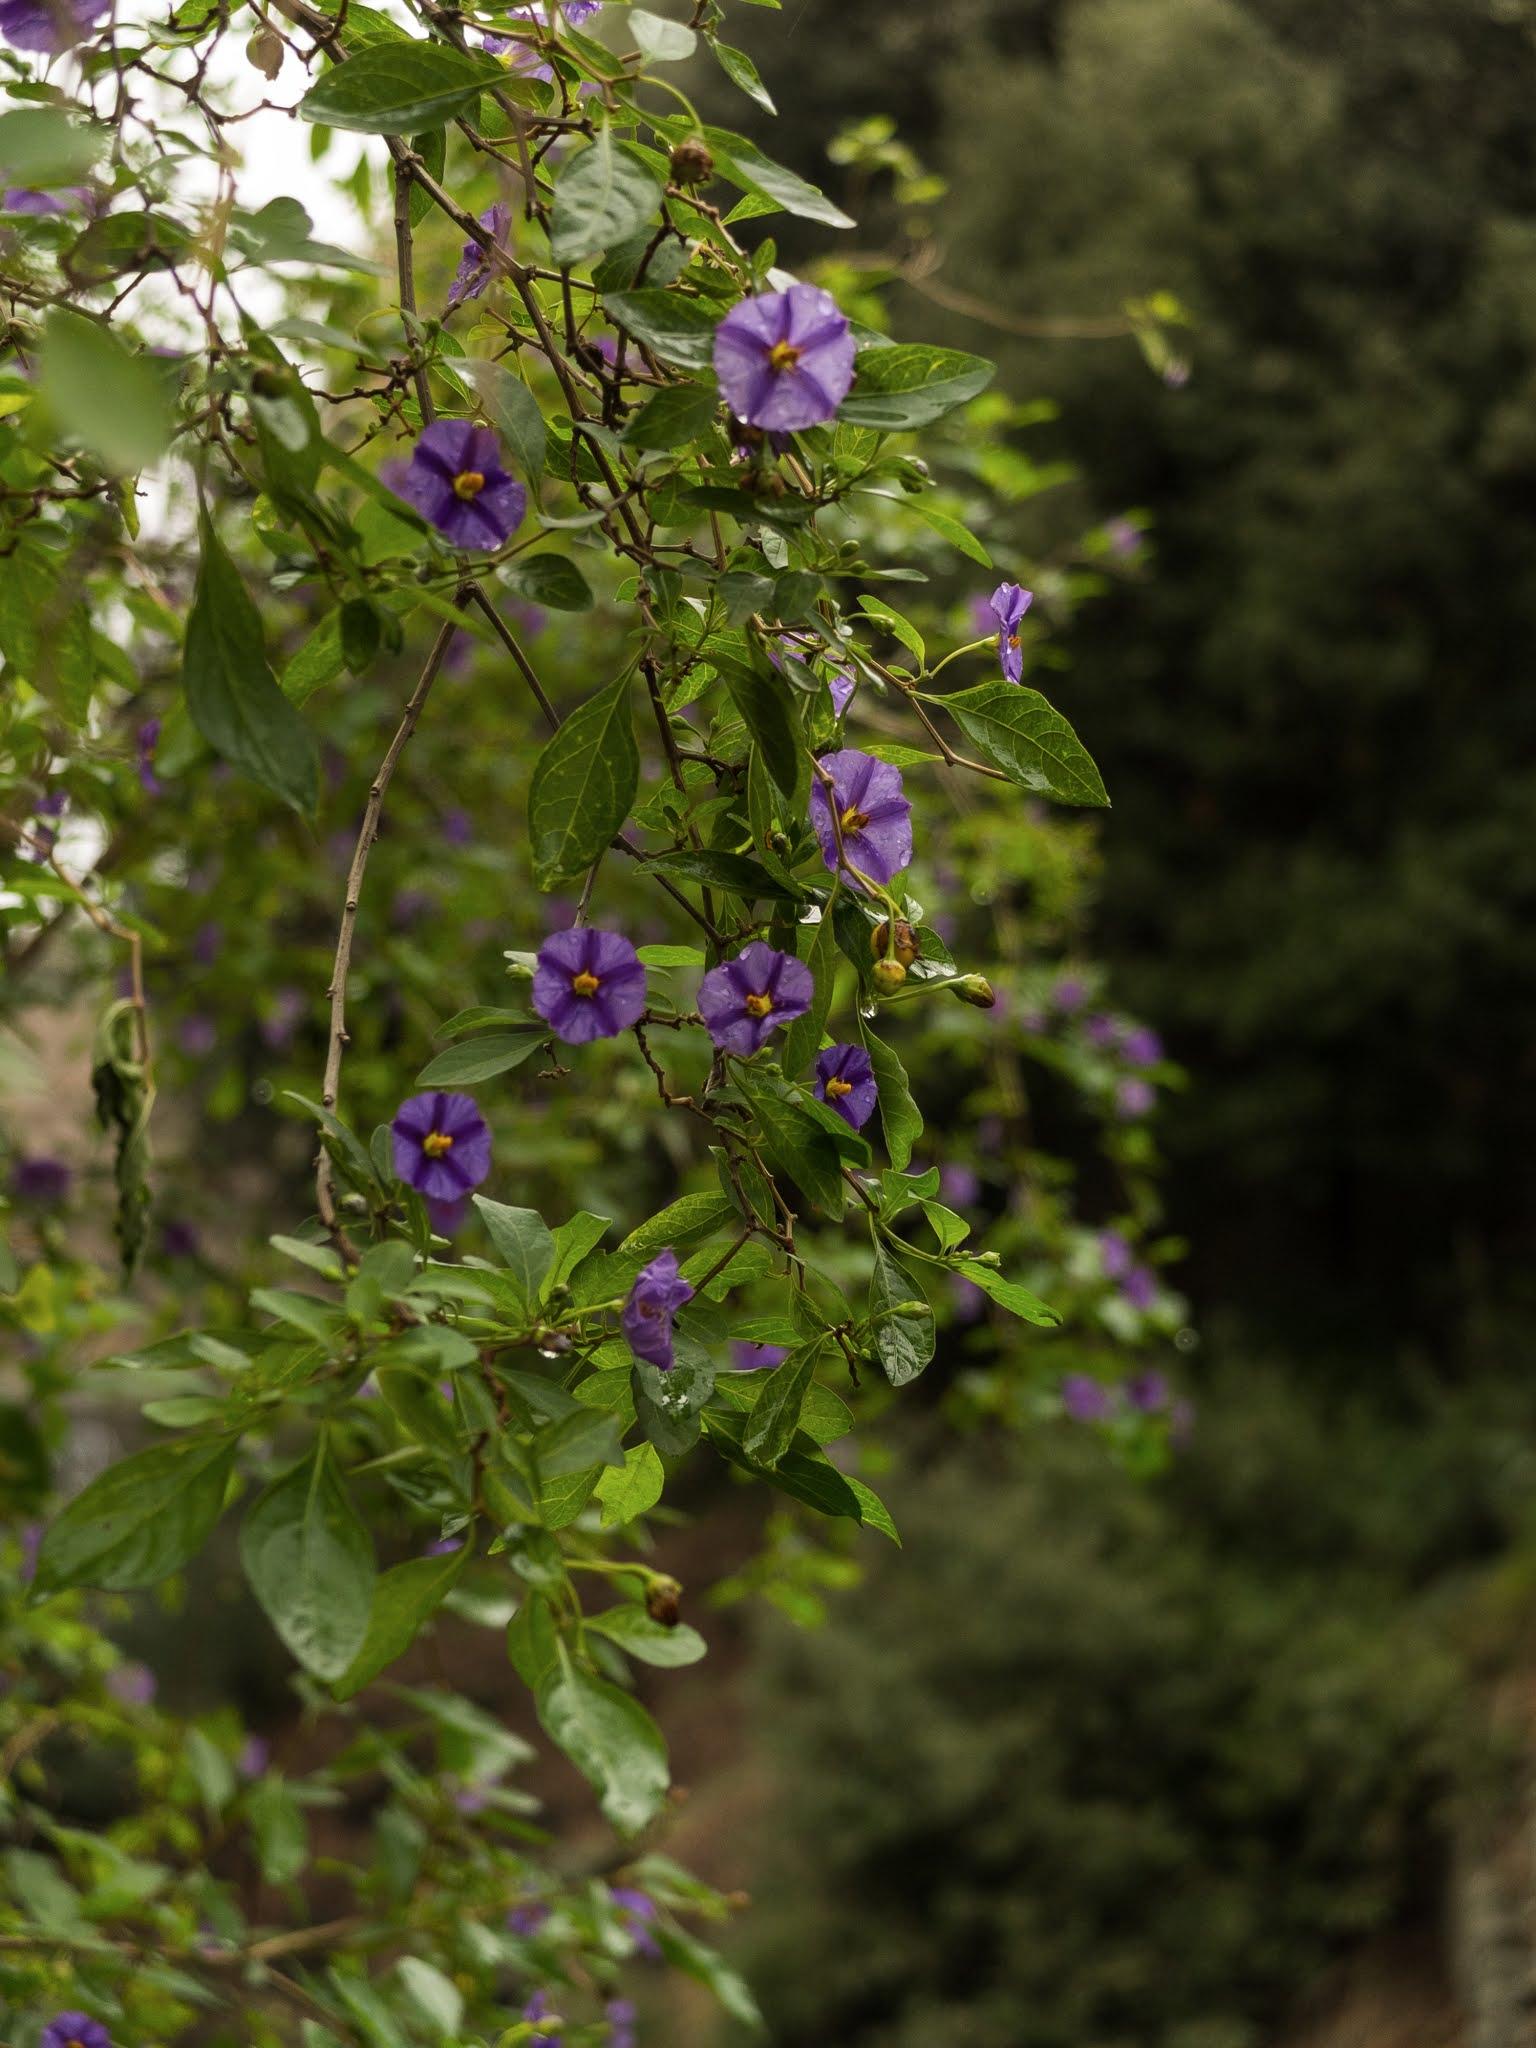 Purple flowers of Lycianthes rantonnetii, the blue potato bush, Paraguay nightshade.